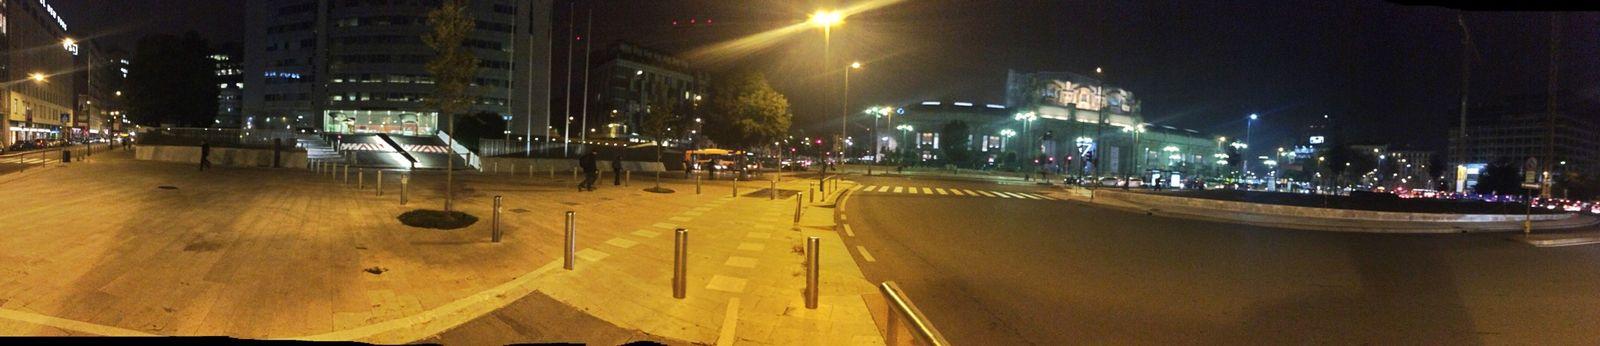 Panorama Night Lights Urban Geometry Traffic